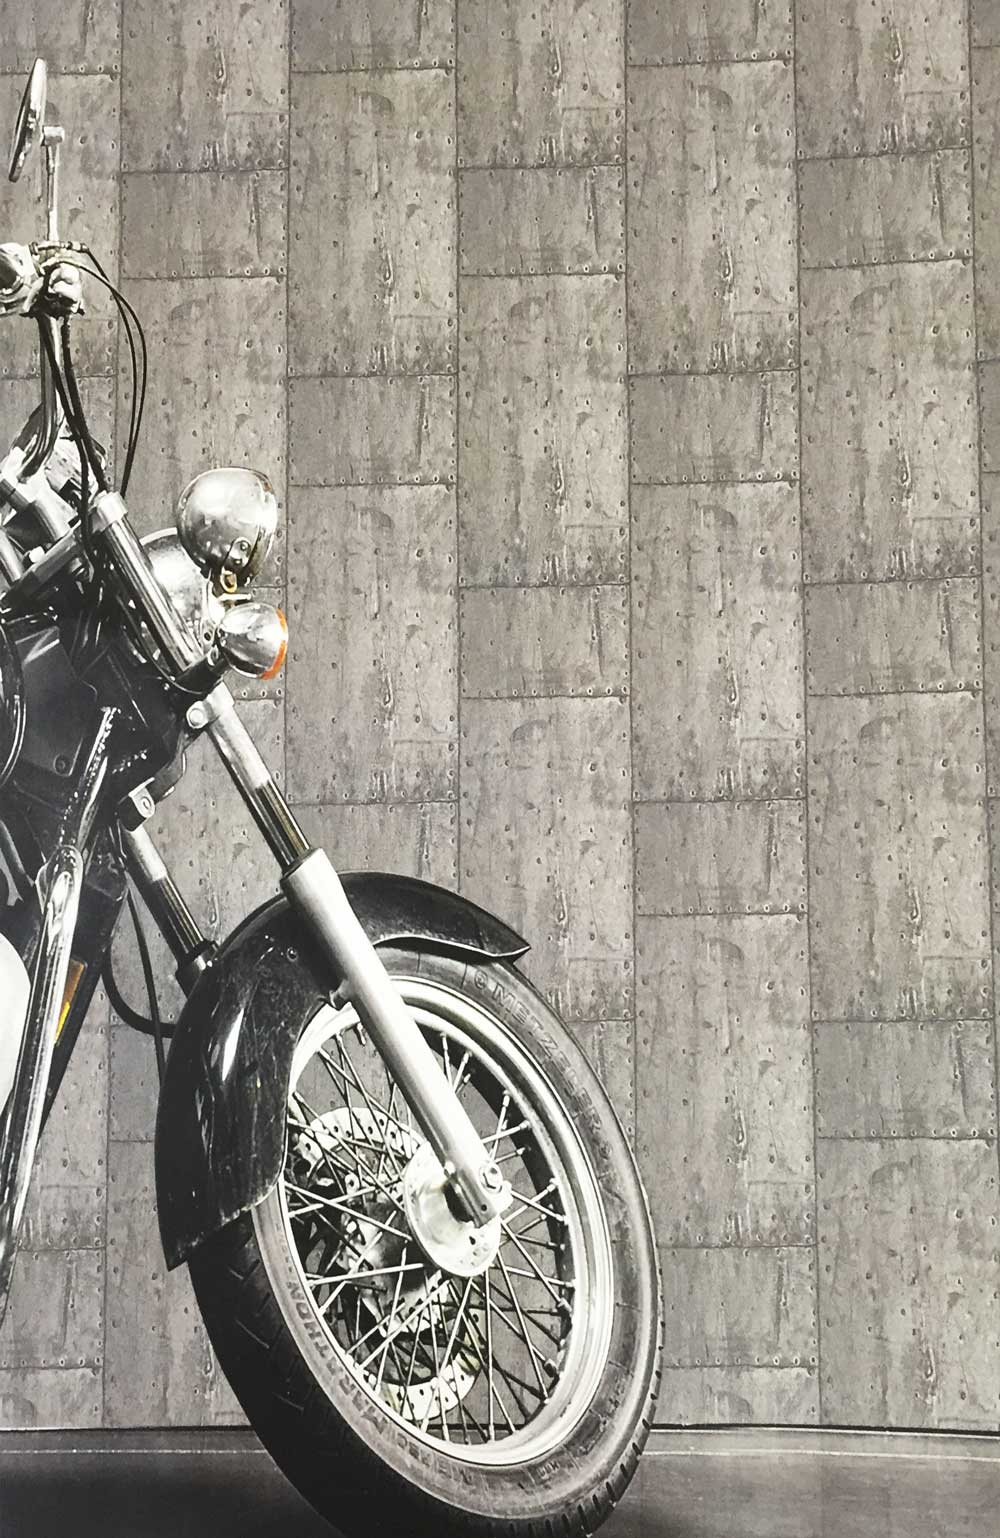 Deco4walls exposed rock stone wallpaper takyin wallpaper - Commercial wallpaper pasting machine ...